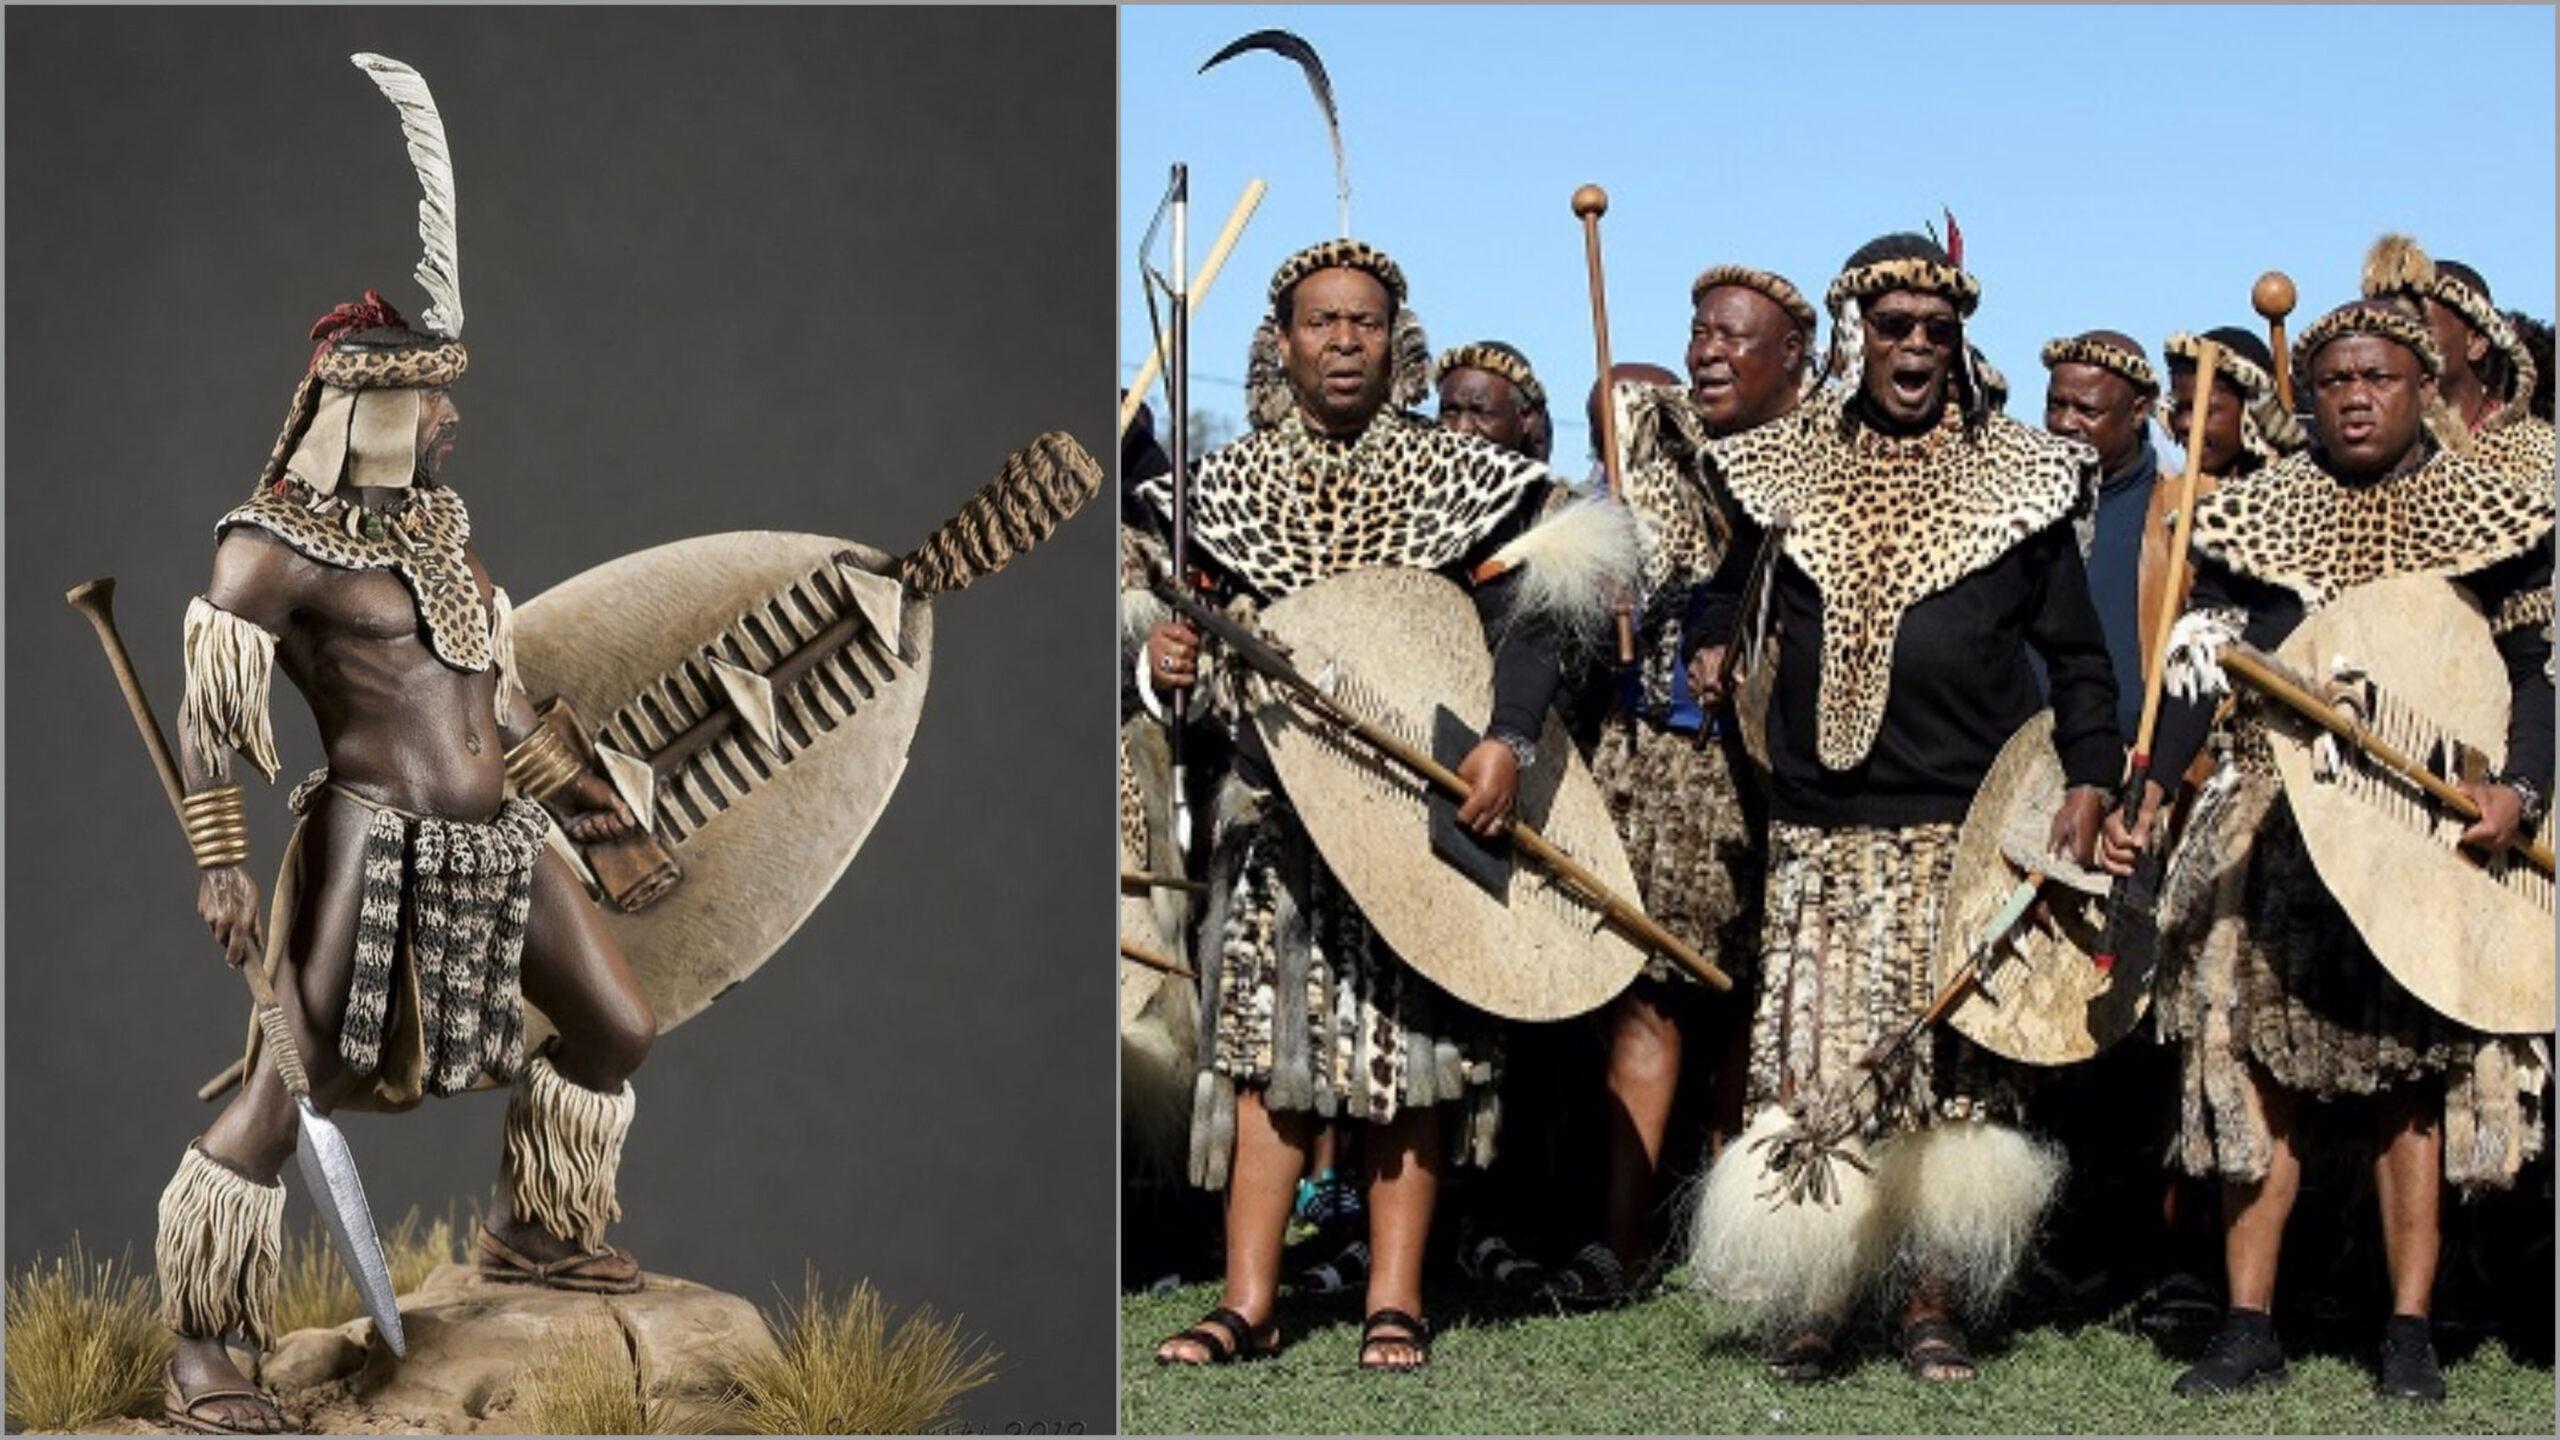 The Rise of Zulu Kingdom